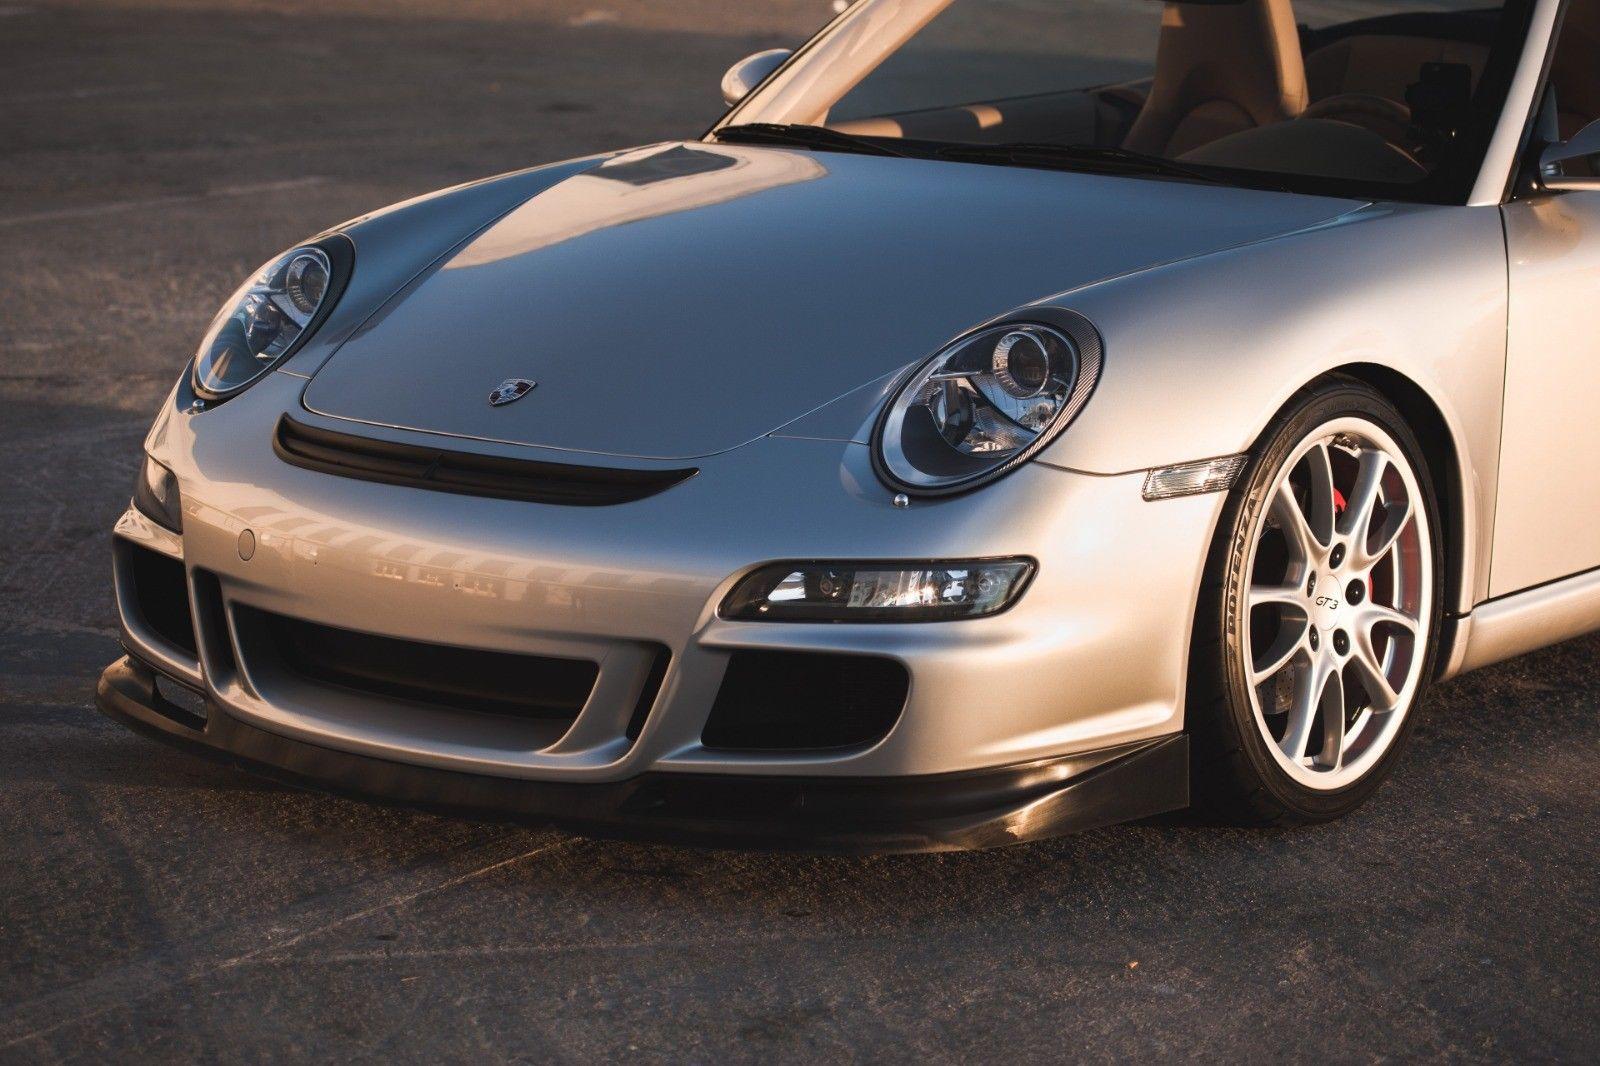 Awesome 2005 Porsche 911 S 2005 Porsche 911 Carrera S Cabriolet Gt3